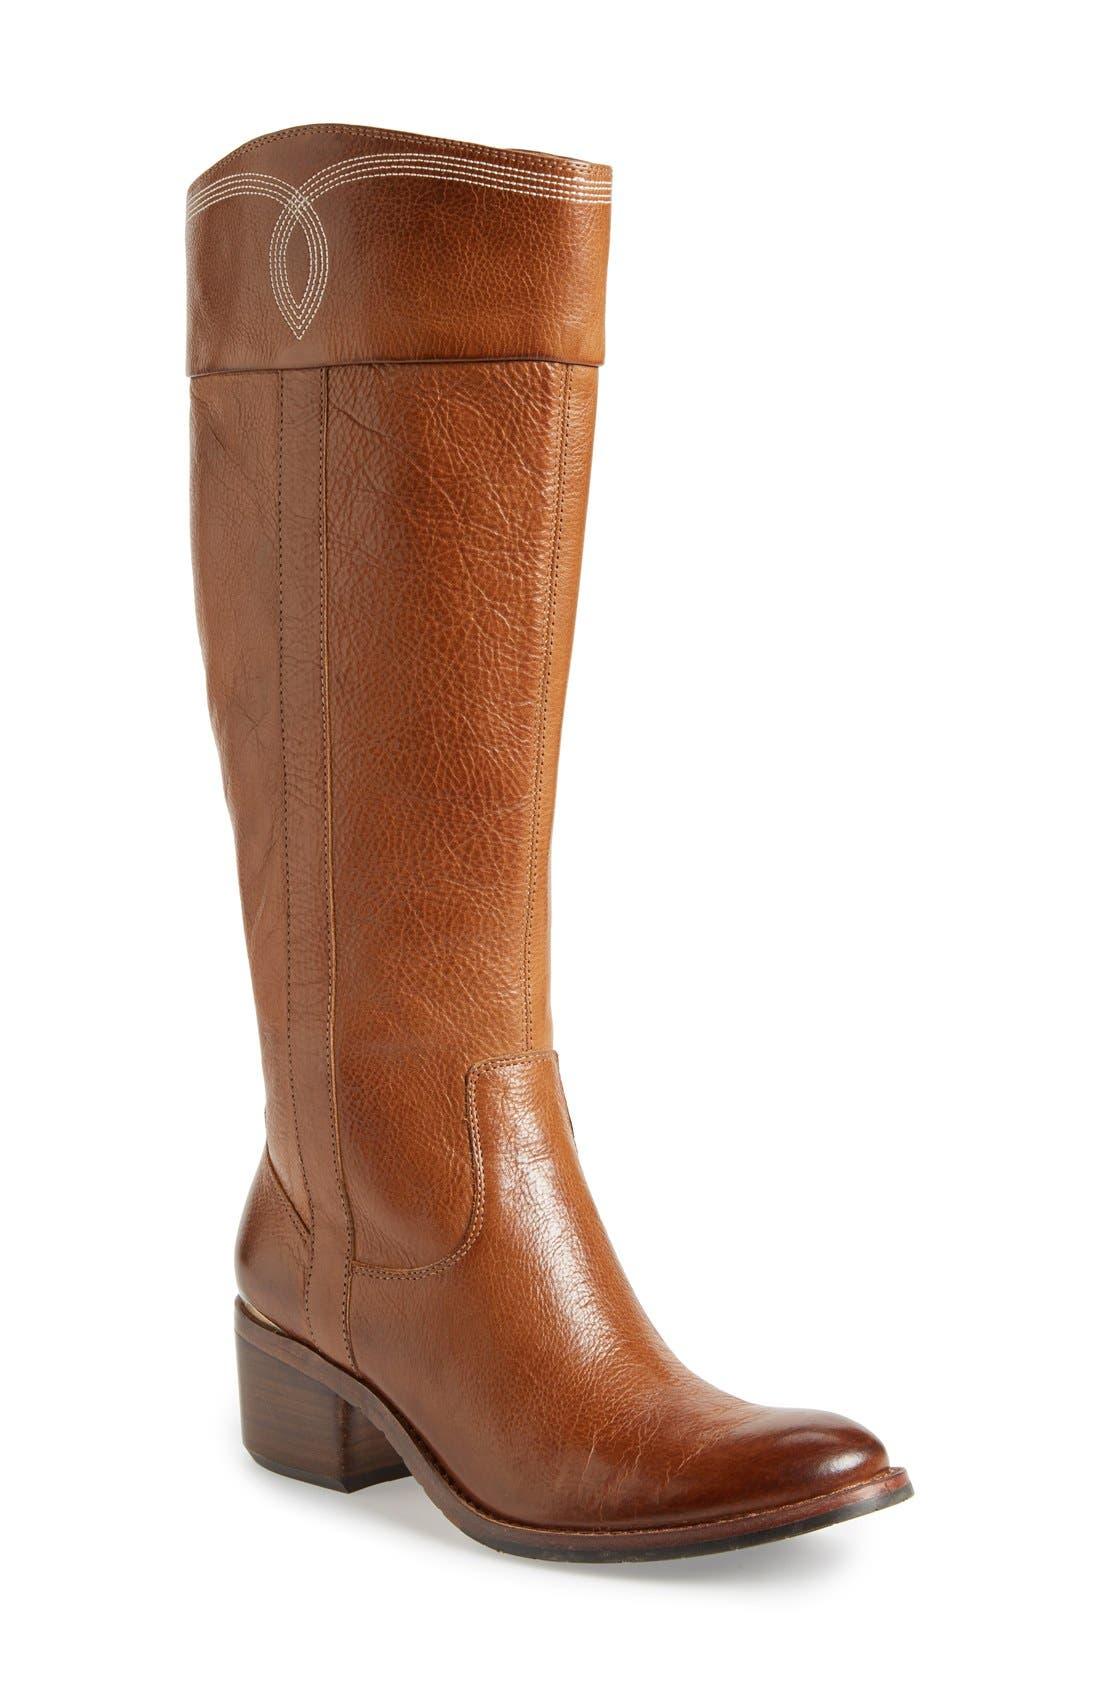 Alternate Image 1 Selected - Donald J Pliner'Willi' Tall Boot (Women)